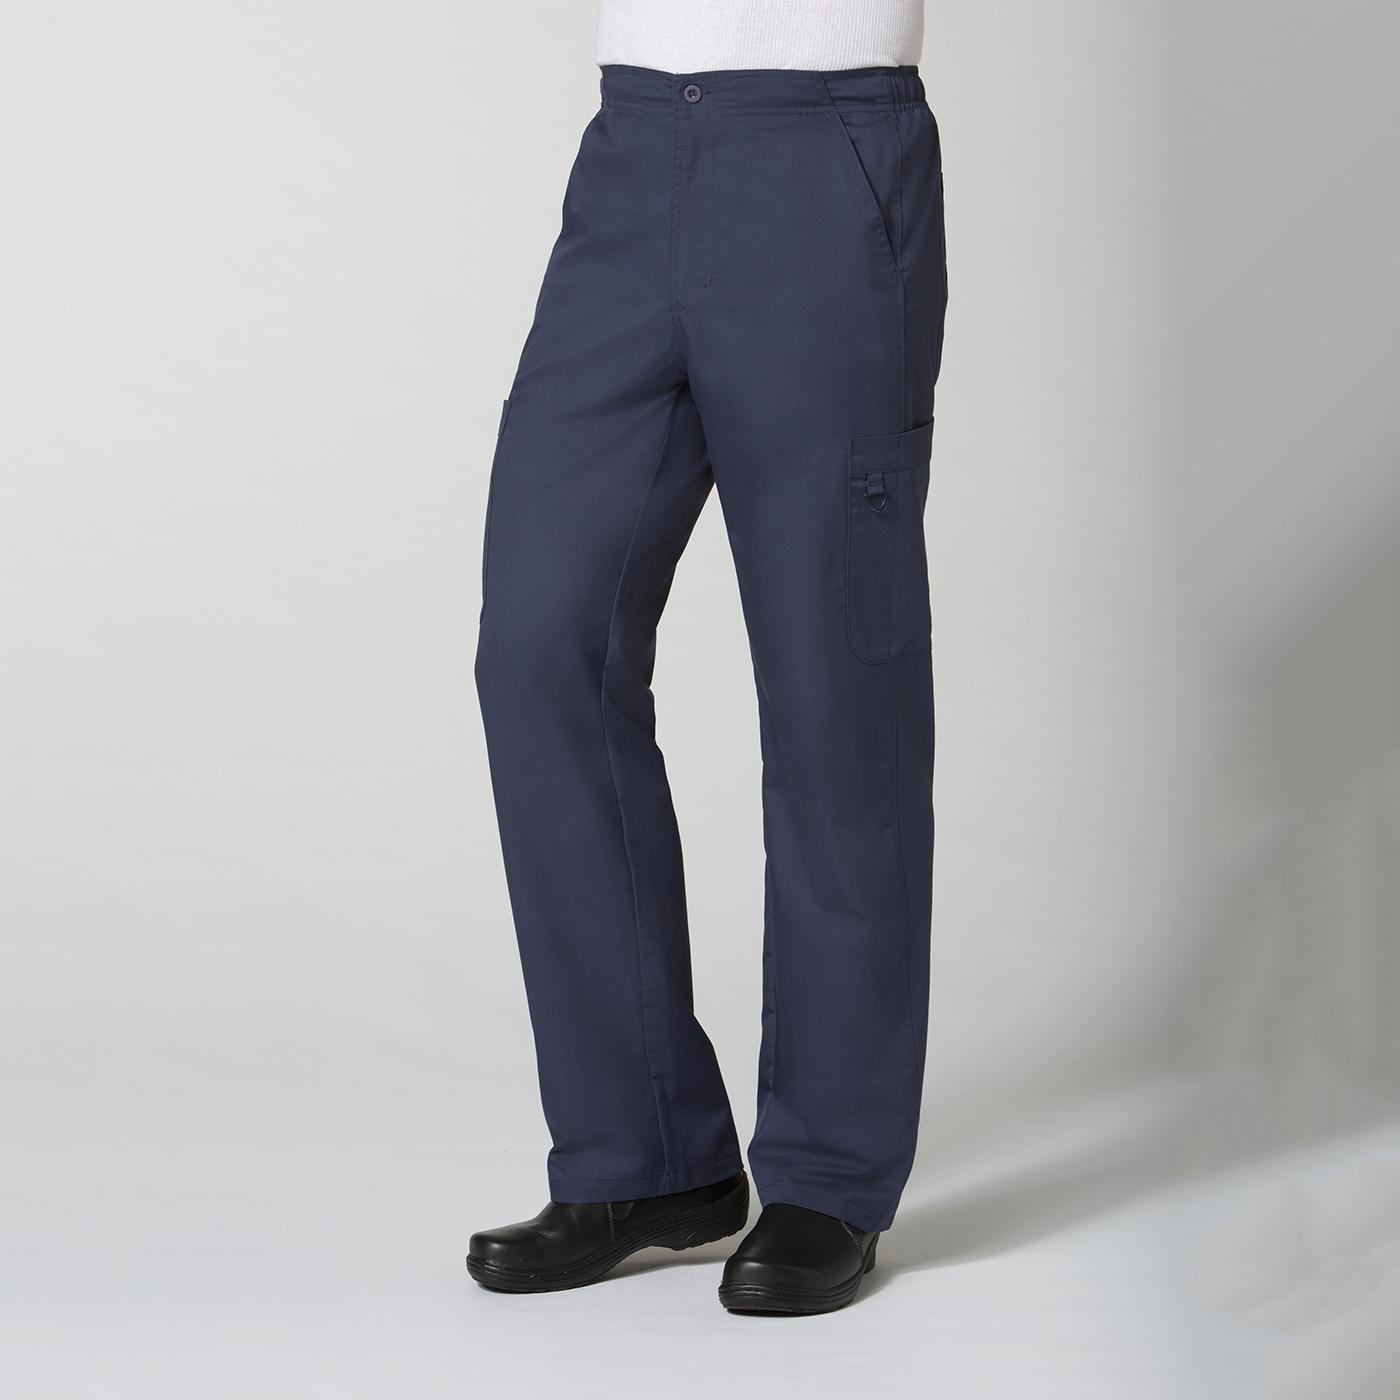 8308 Men S Half Elastic Cargo Pant